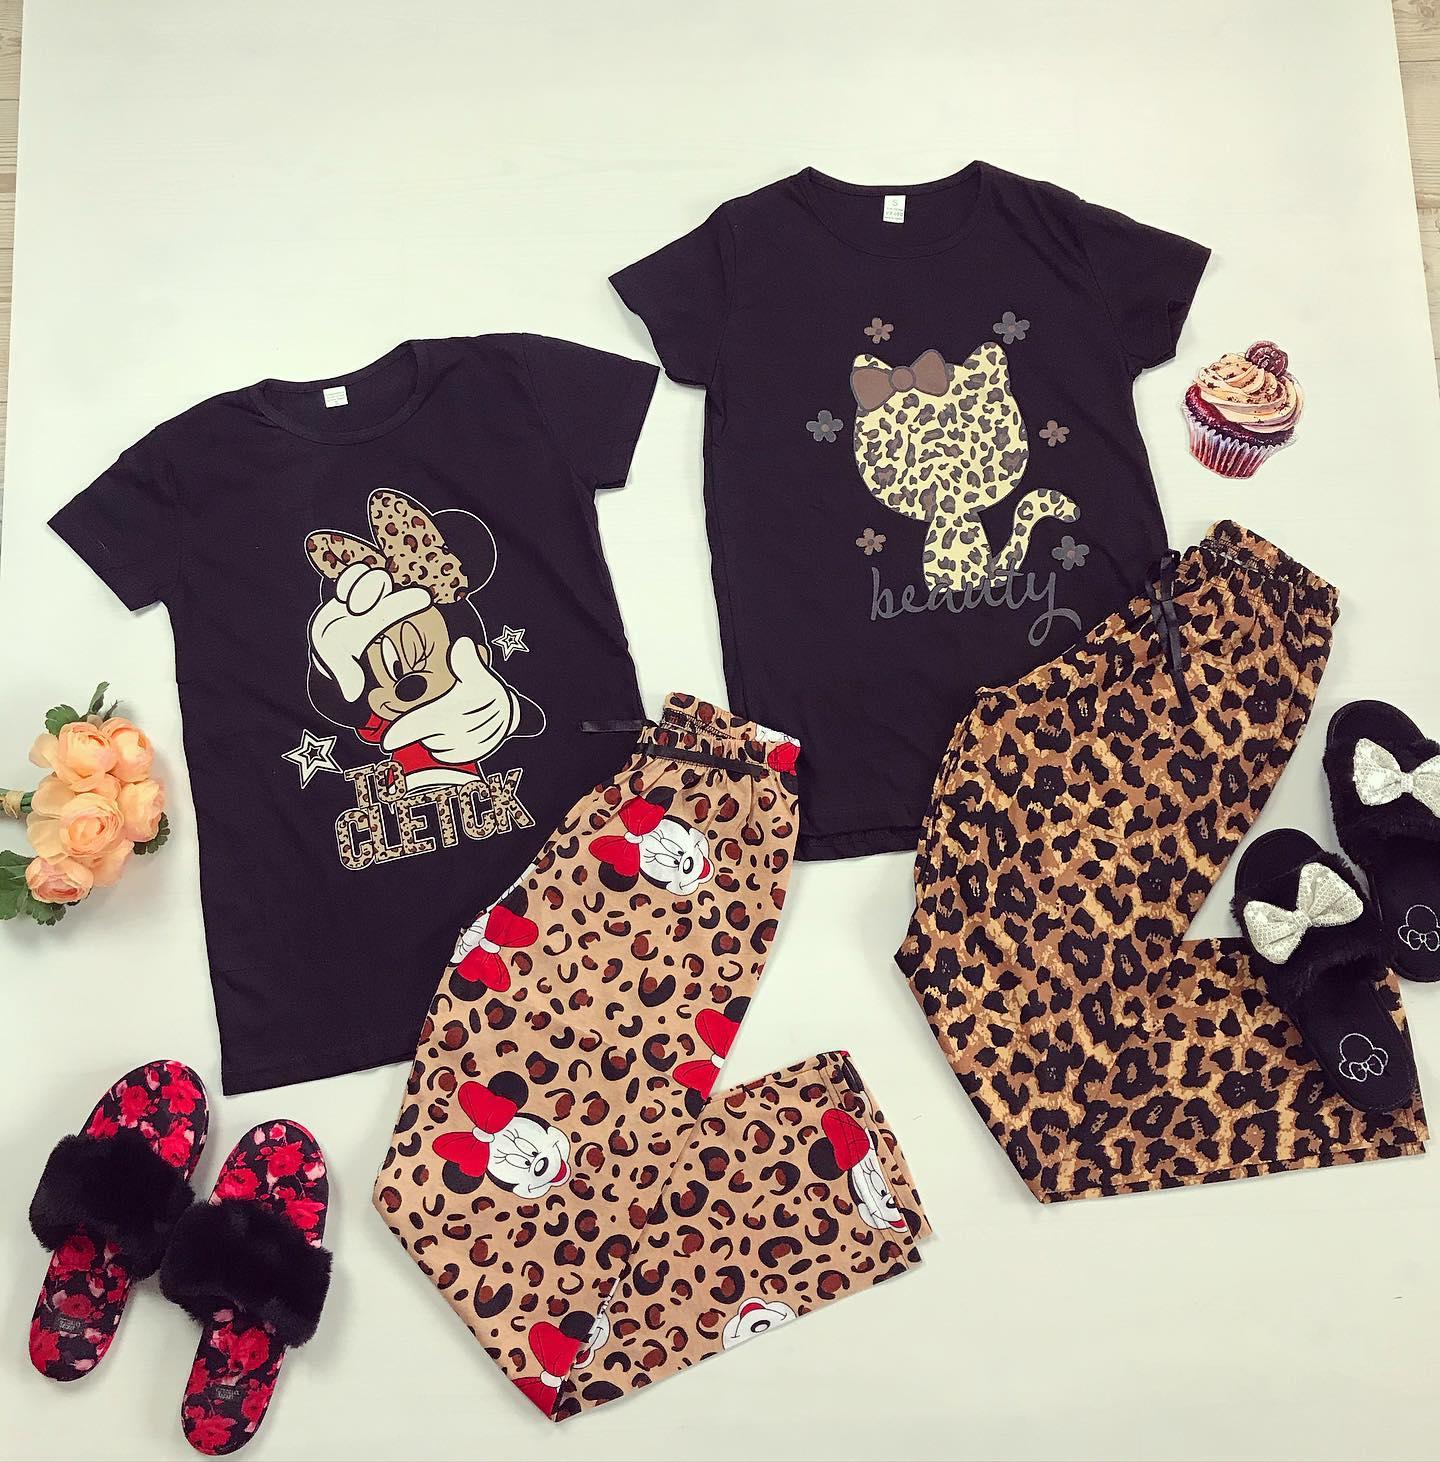 🎉😇Weekendul acesta e timpul pentru #shopping!🥰 Iti poti alege o multime de pijamale dragute, mai ales ca beneficiezi si de o super oferta: 2 pijamale la doar 79 lei! 💕 Shop now via @maroko.ro 👏 #onlygoodvibes #pajamas #shoponline #shoppingonline #fall #style #fashion